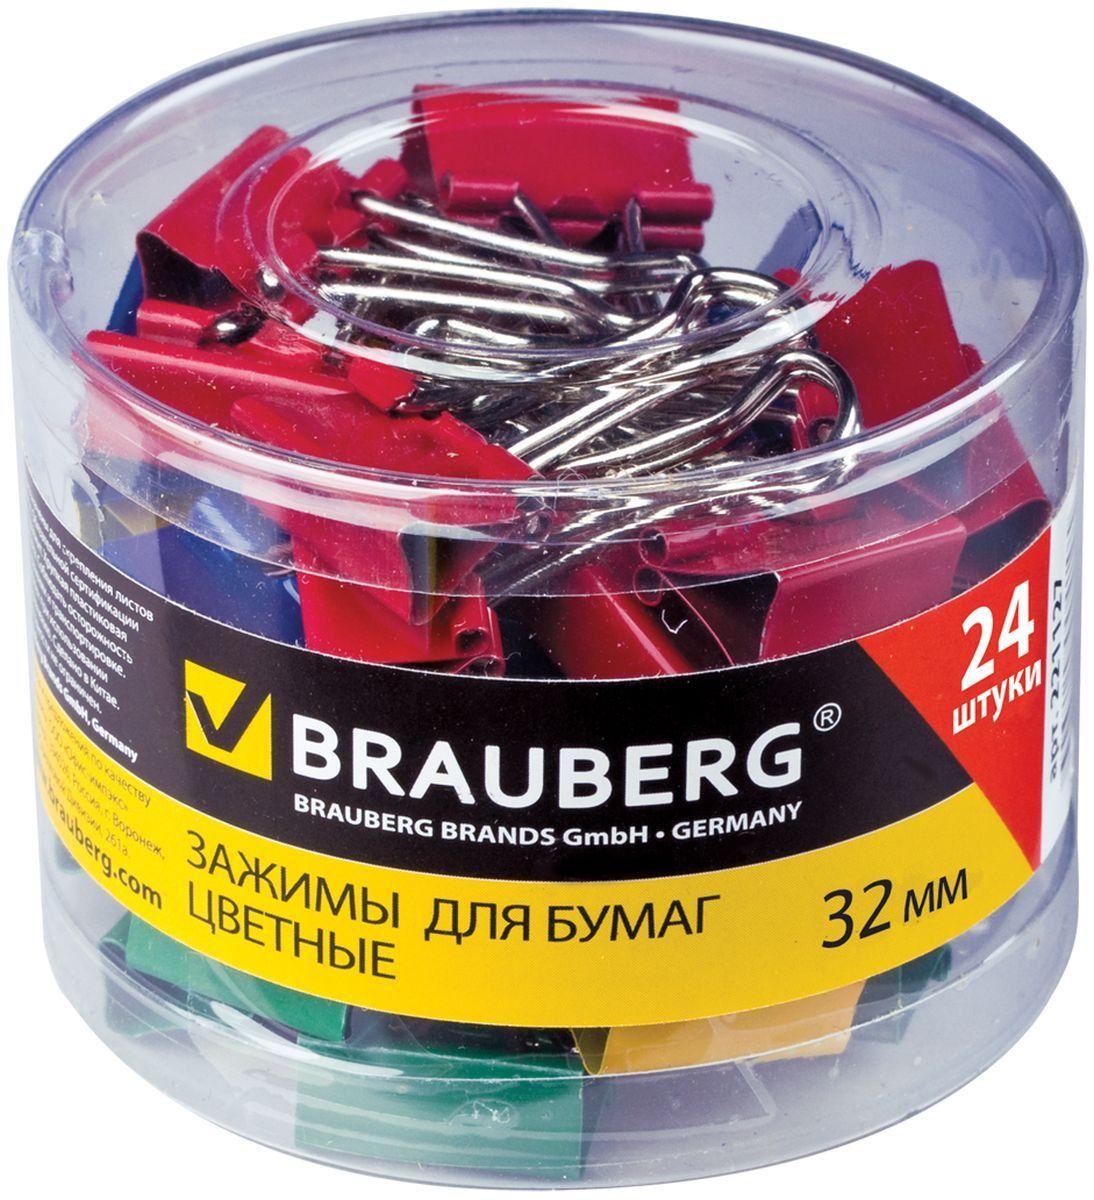 Brauberg Зажим для бумаг 32 мм 24 шт -  Скрепки, кнопки, зажимы